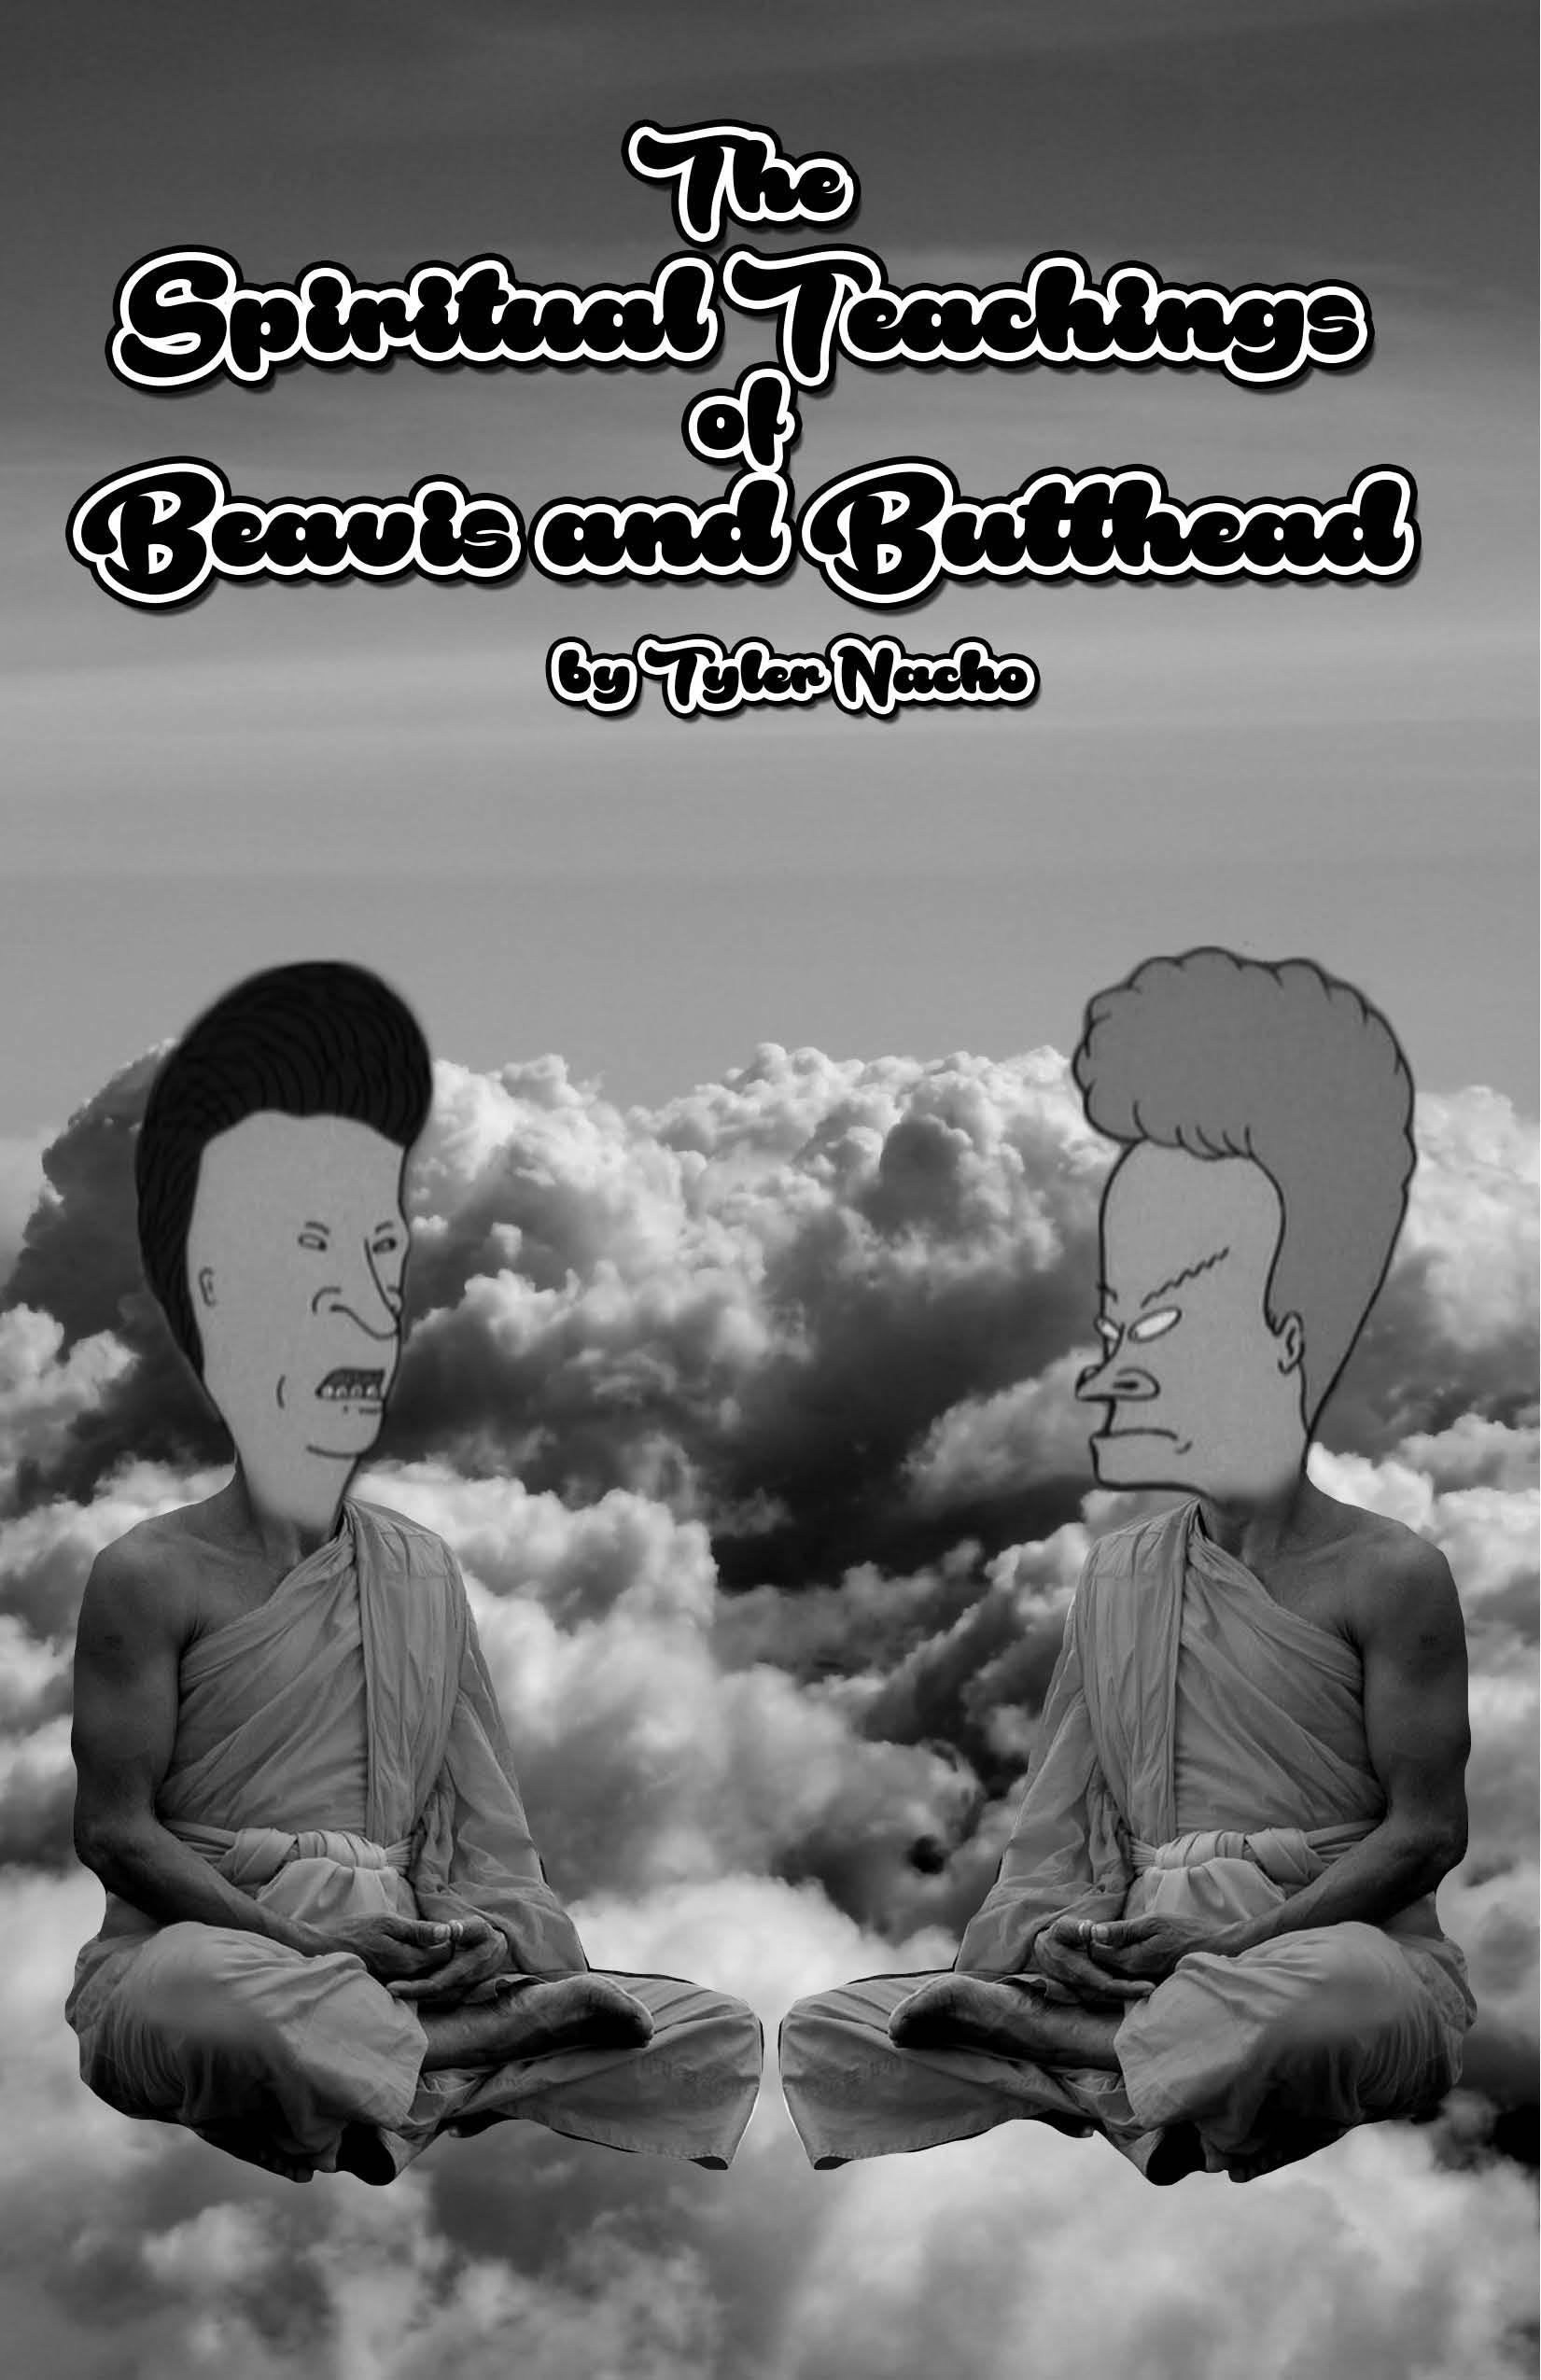 The Spiritual Teachings of Beavis and Butthead.jpg